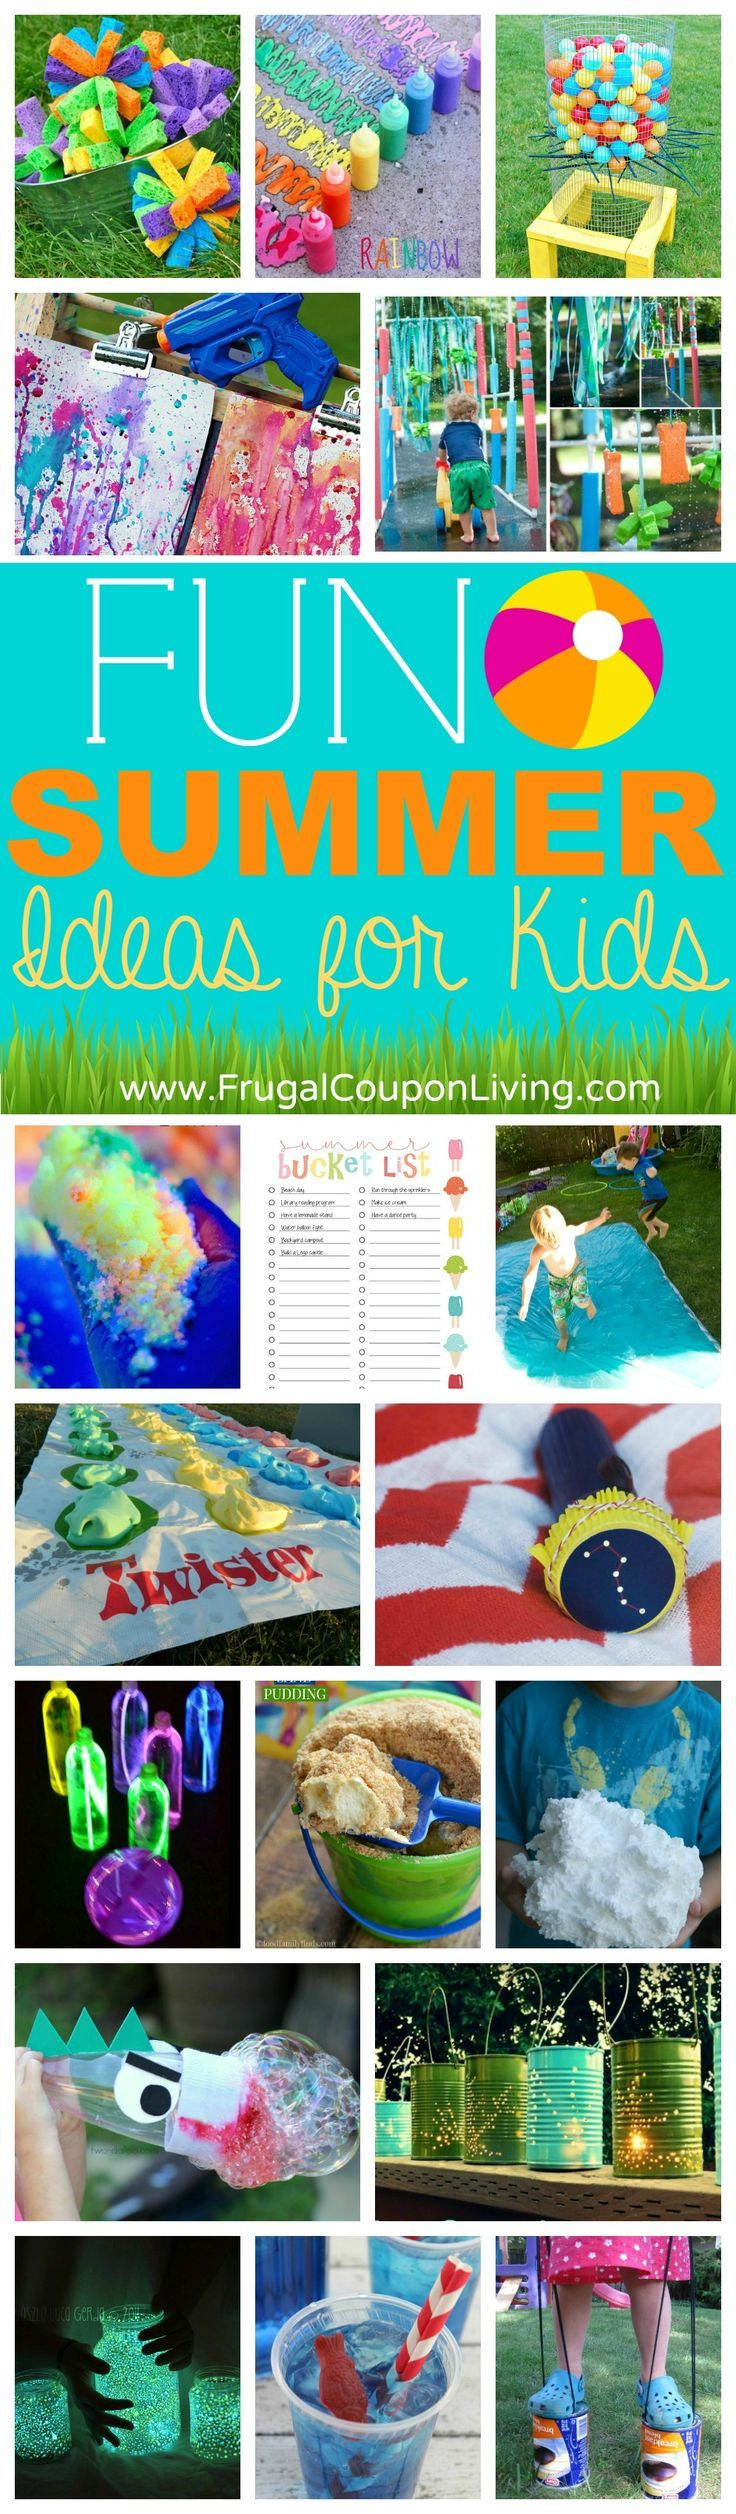 diy summer fun ideas for kids frugal summer bucket lists and